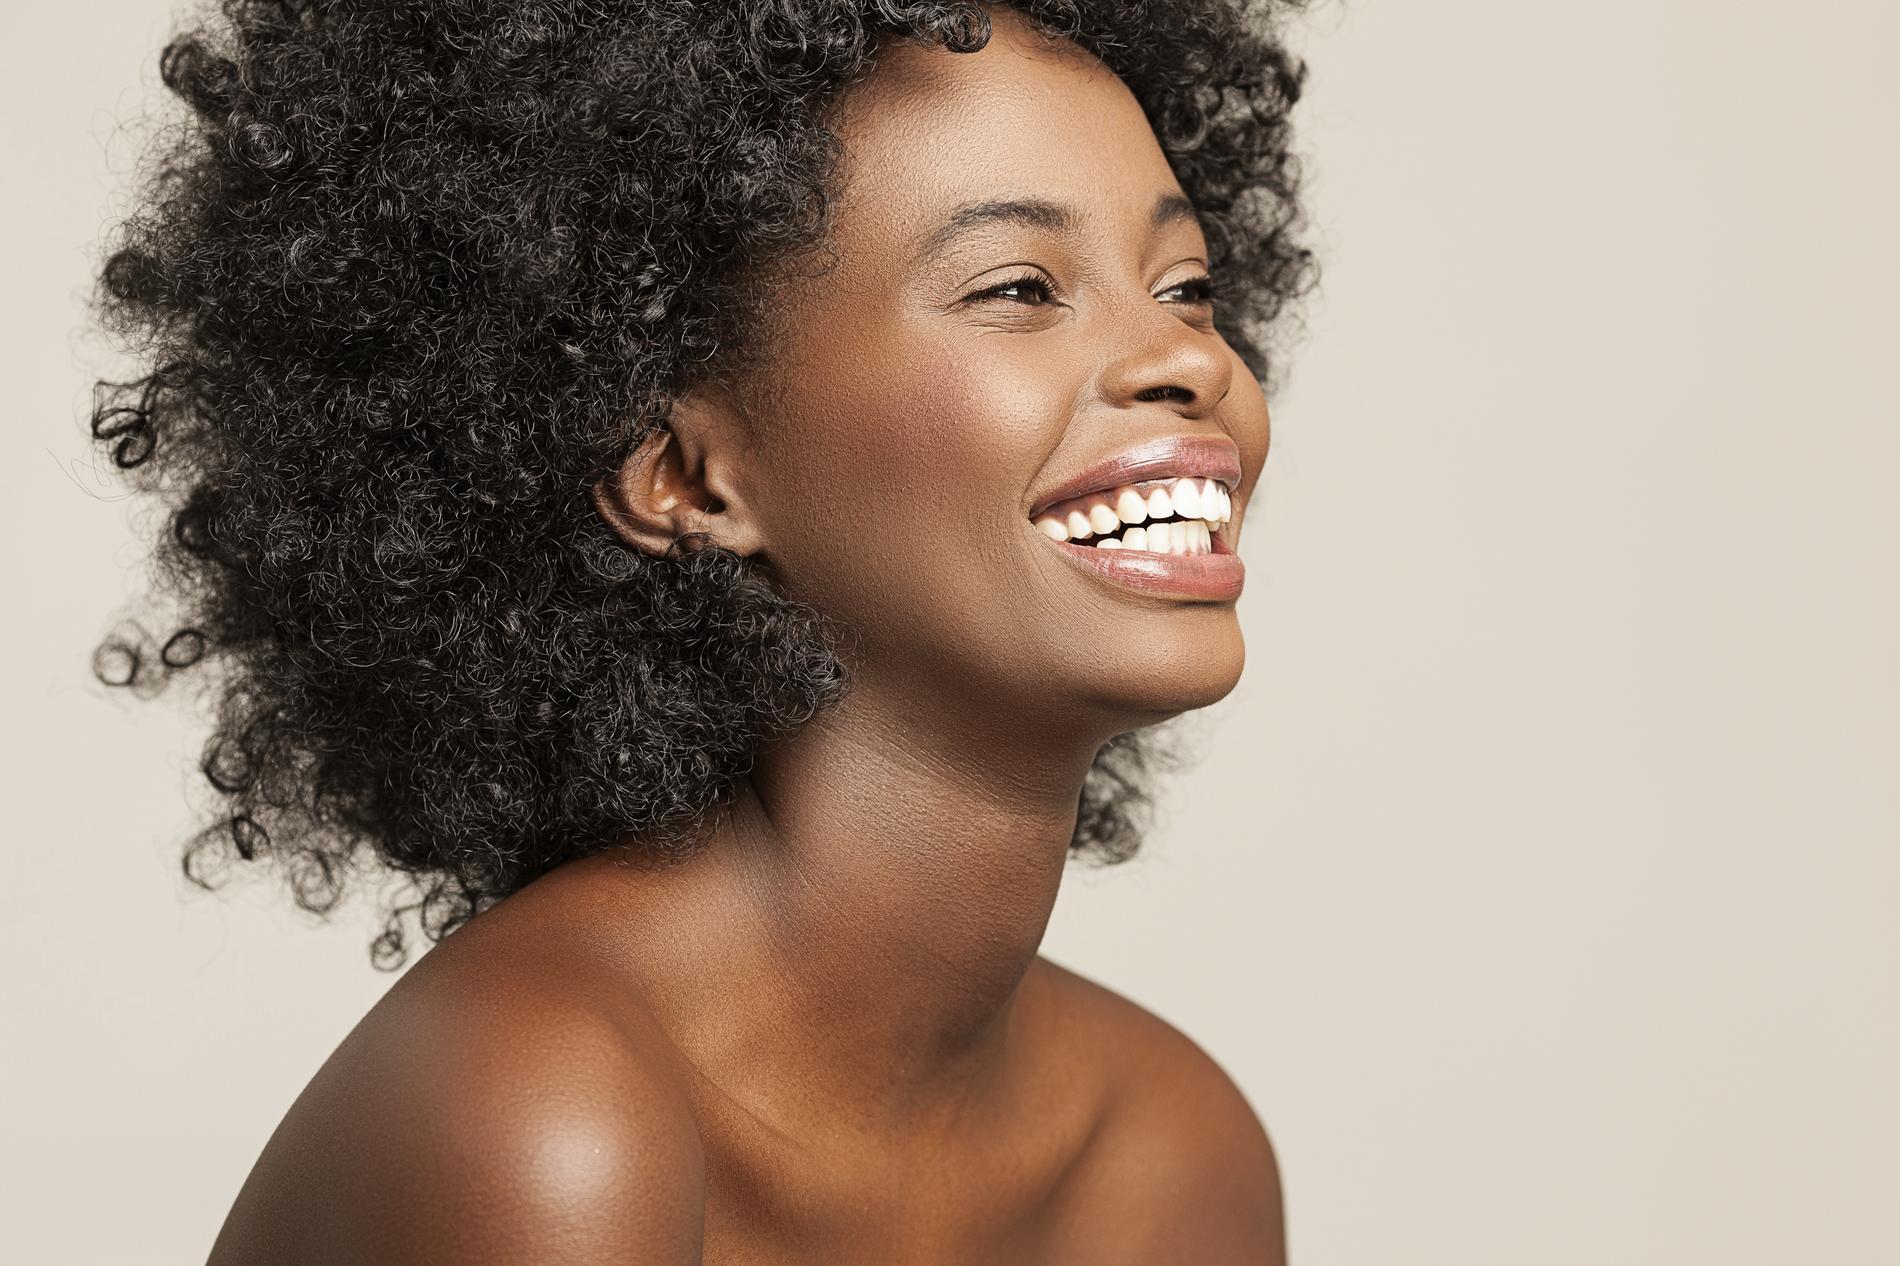 Coiffure afro - Madame Figaro